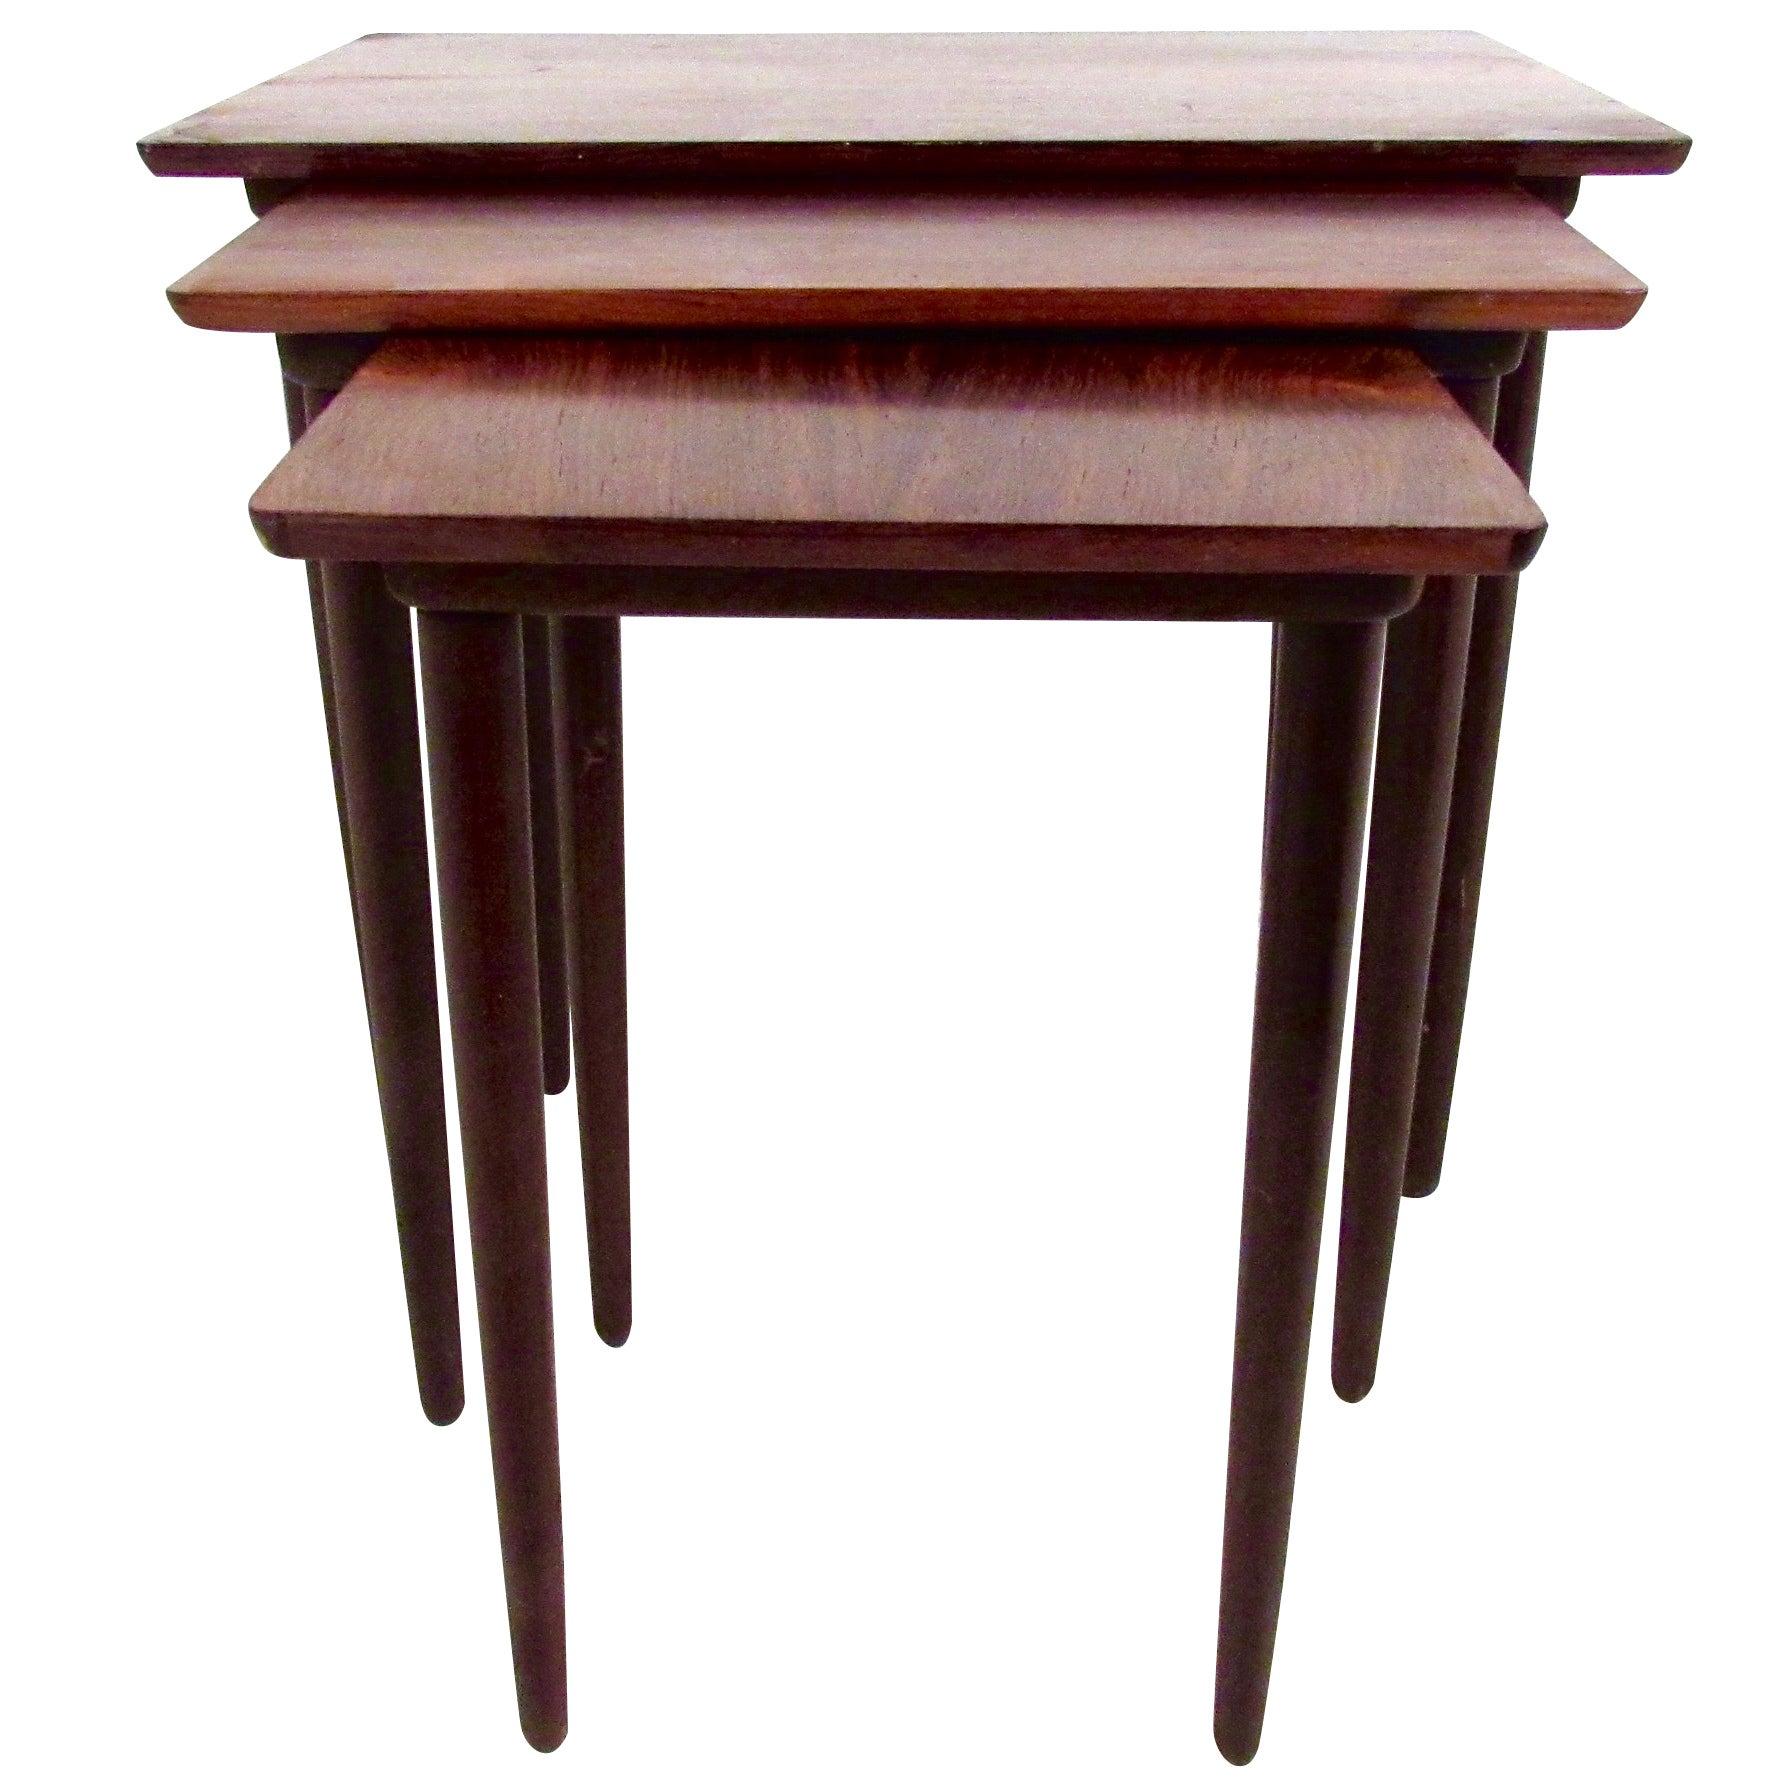 Danish Modern Rosewood Nesting Tables by Bramin